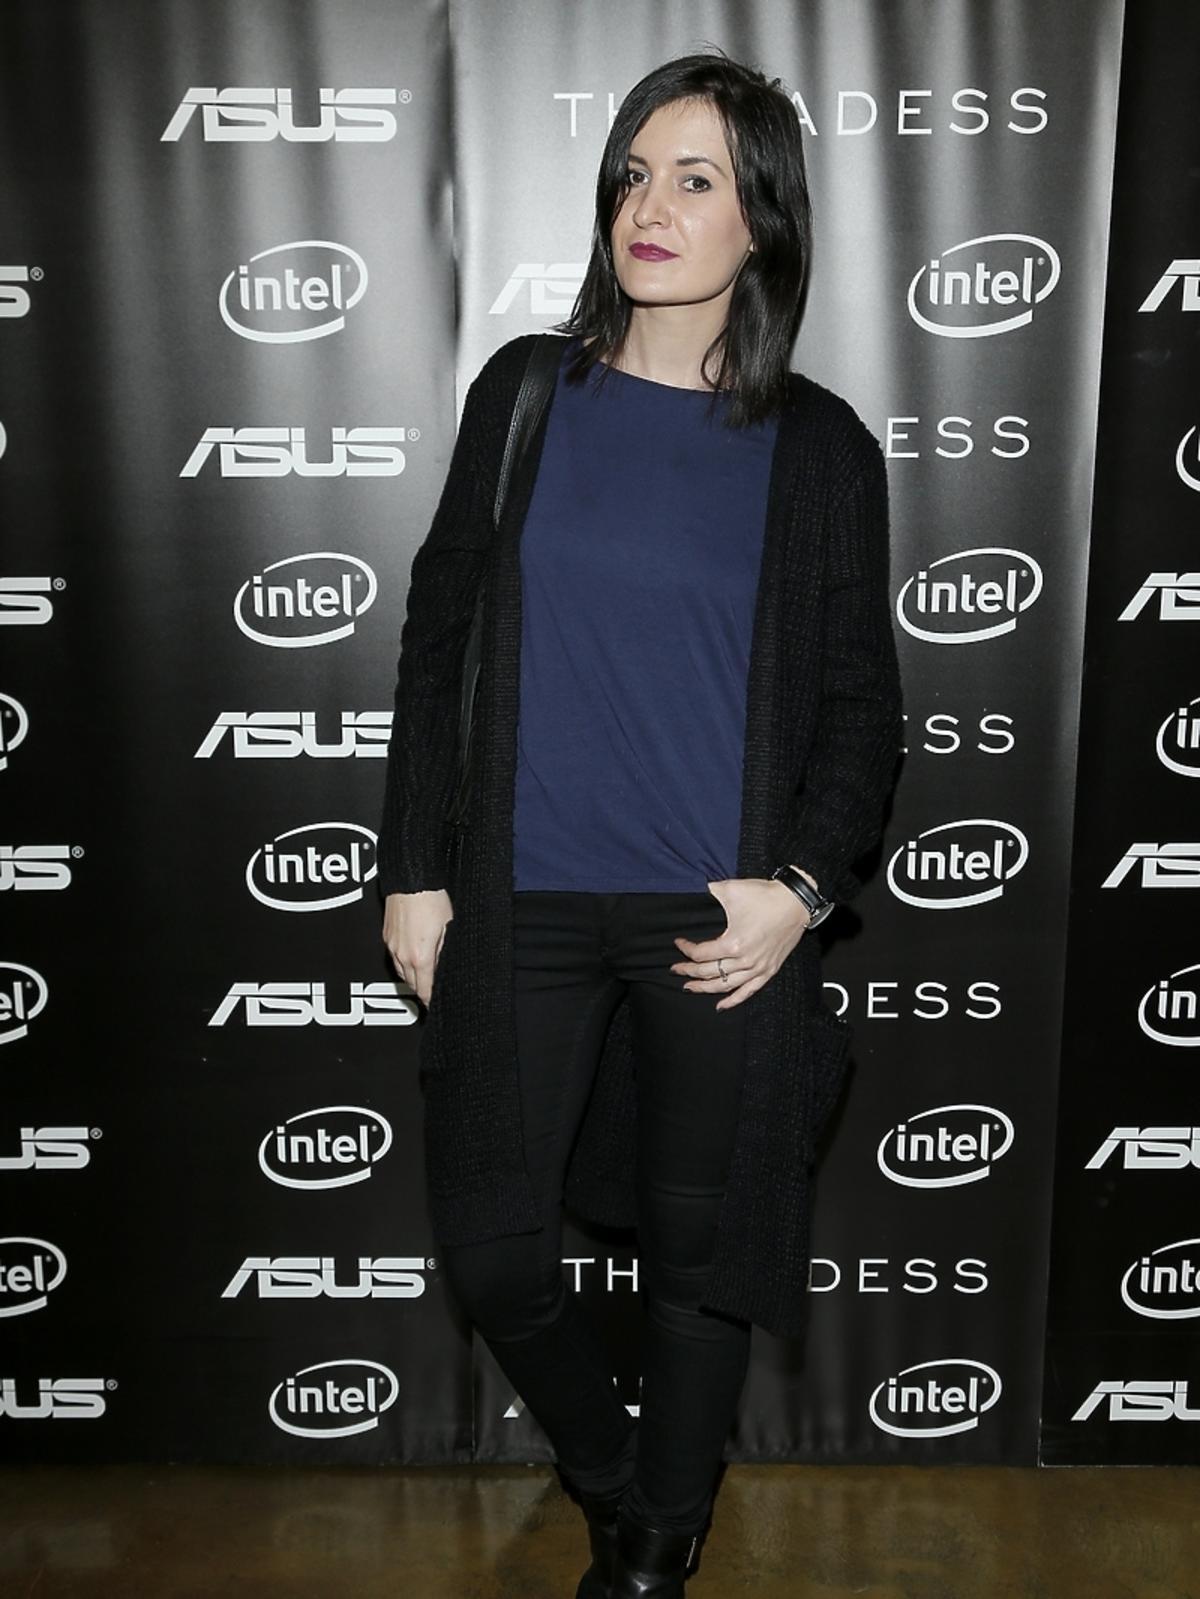 Natalia Viktorovna - Glamourina na spotkaniu marek THECADESS i Asus